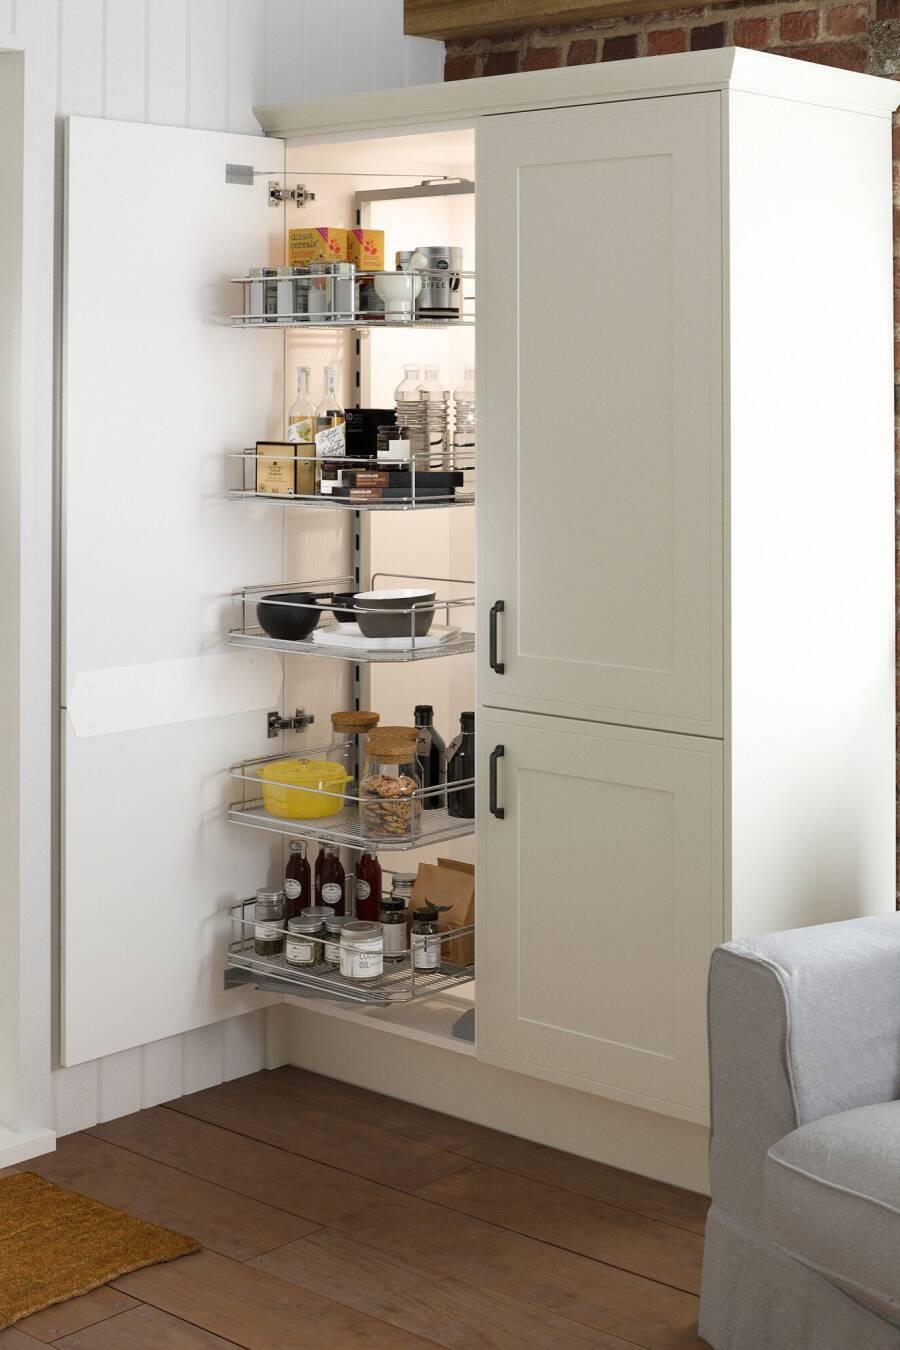 10 Smart Storage Tips For Small Kitchens Wren Kitchens